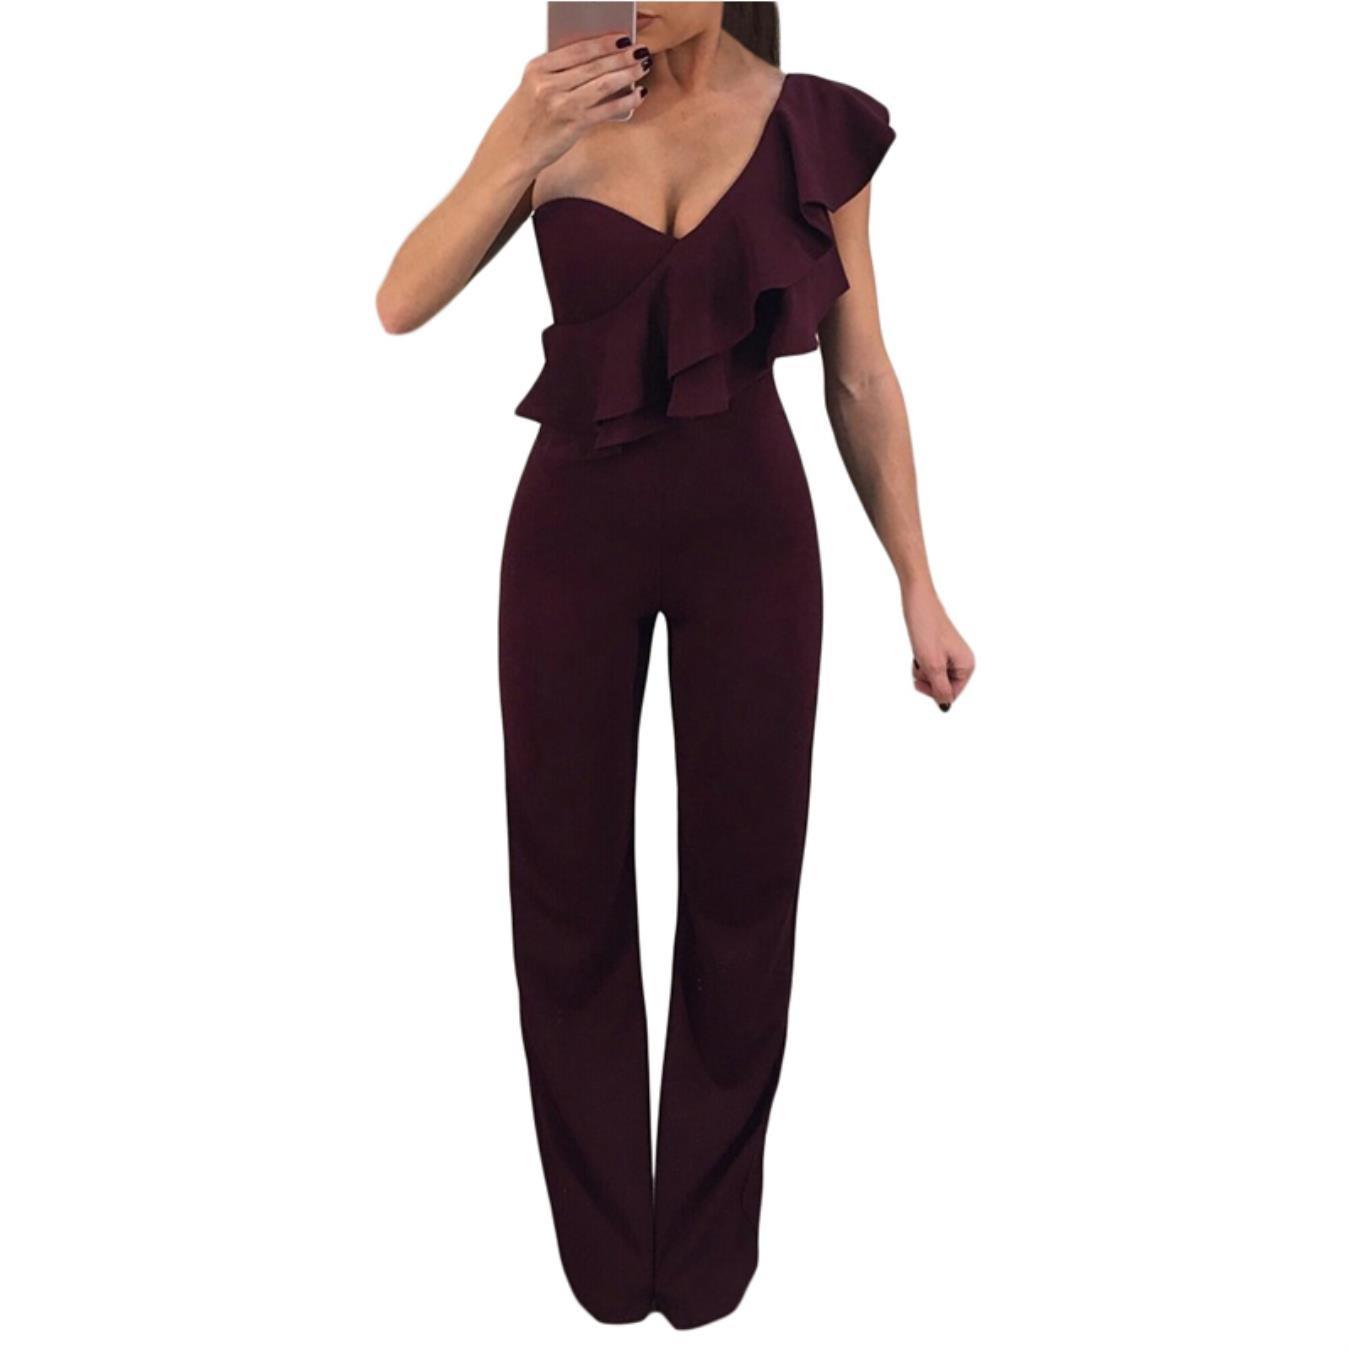 2eb8985b760b Amazon.com  KHGYSJ Women Long Pants Sexy Elegant Jumpsuits Wide Legs Rompers  Womens Casual Jumpsuit  Clothing